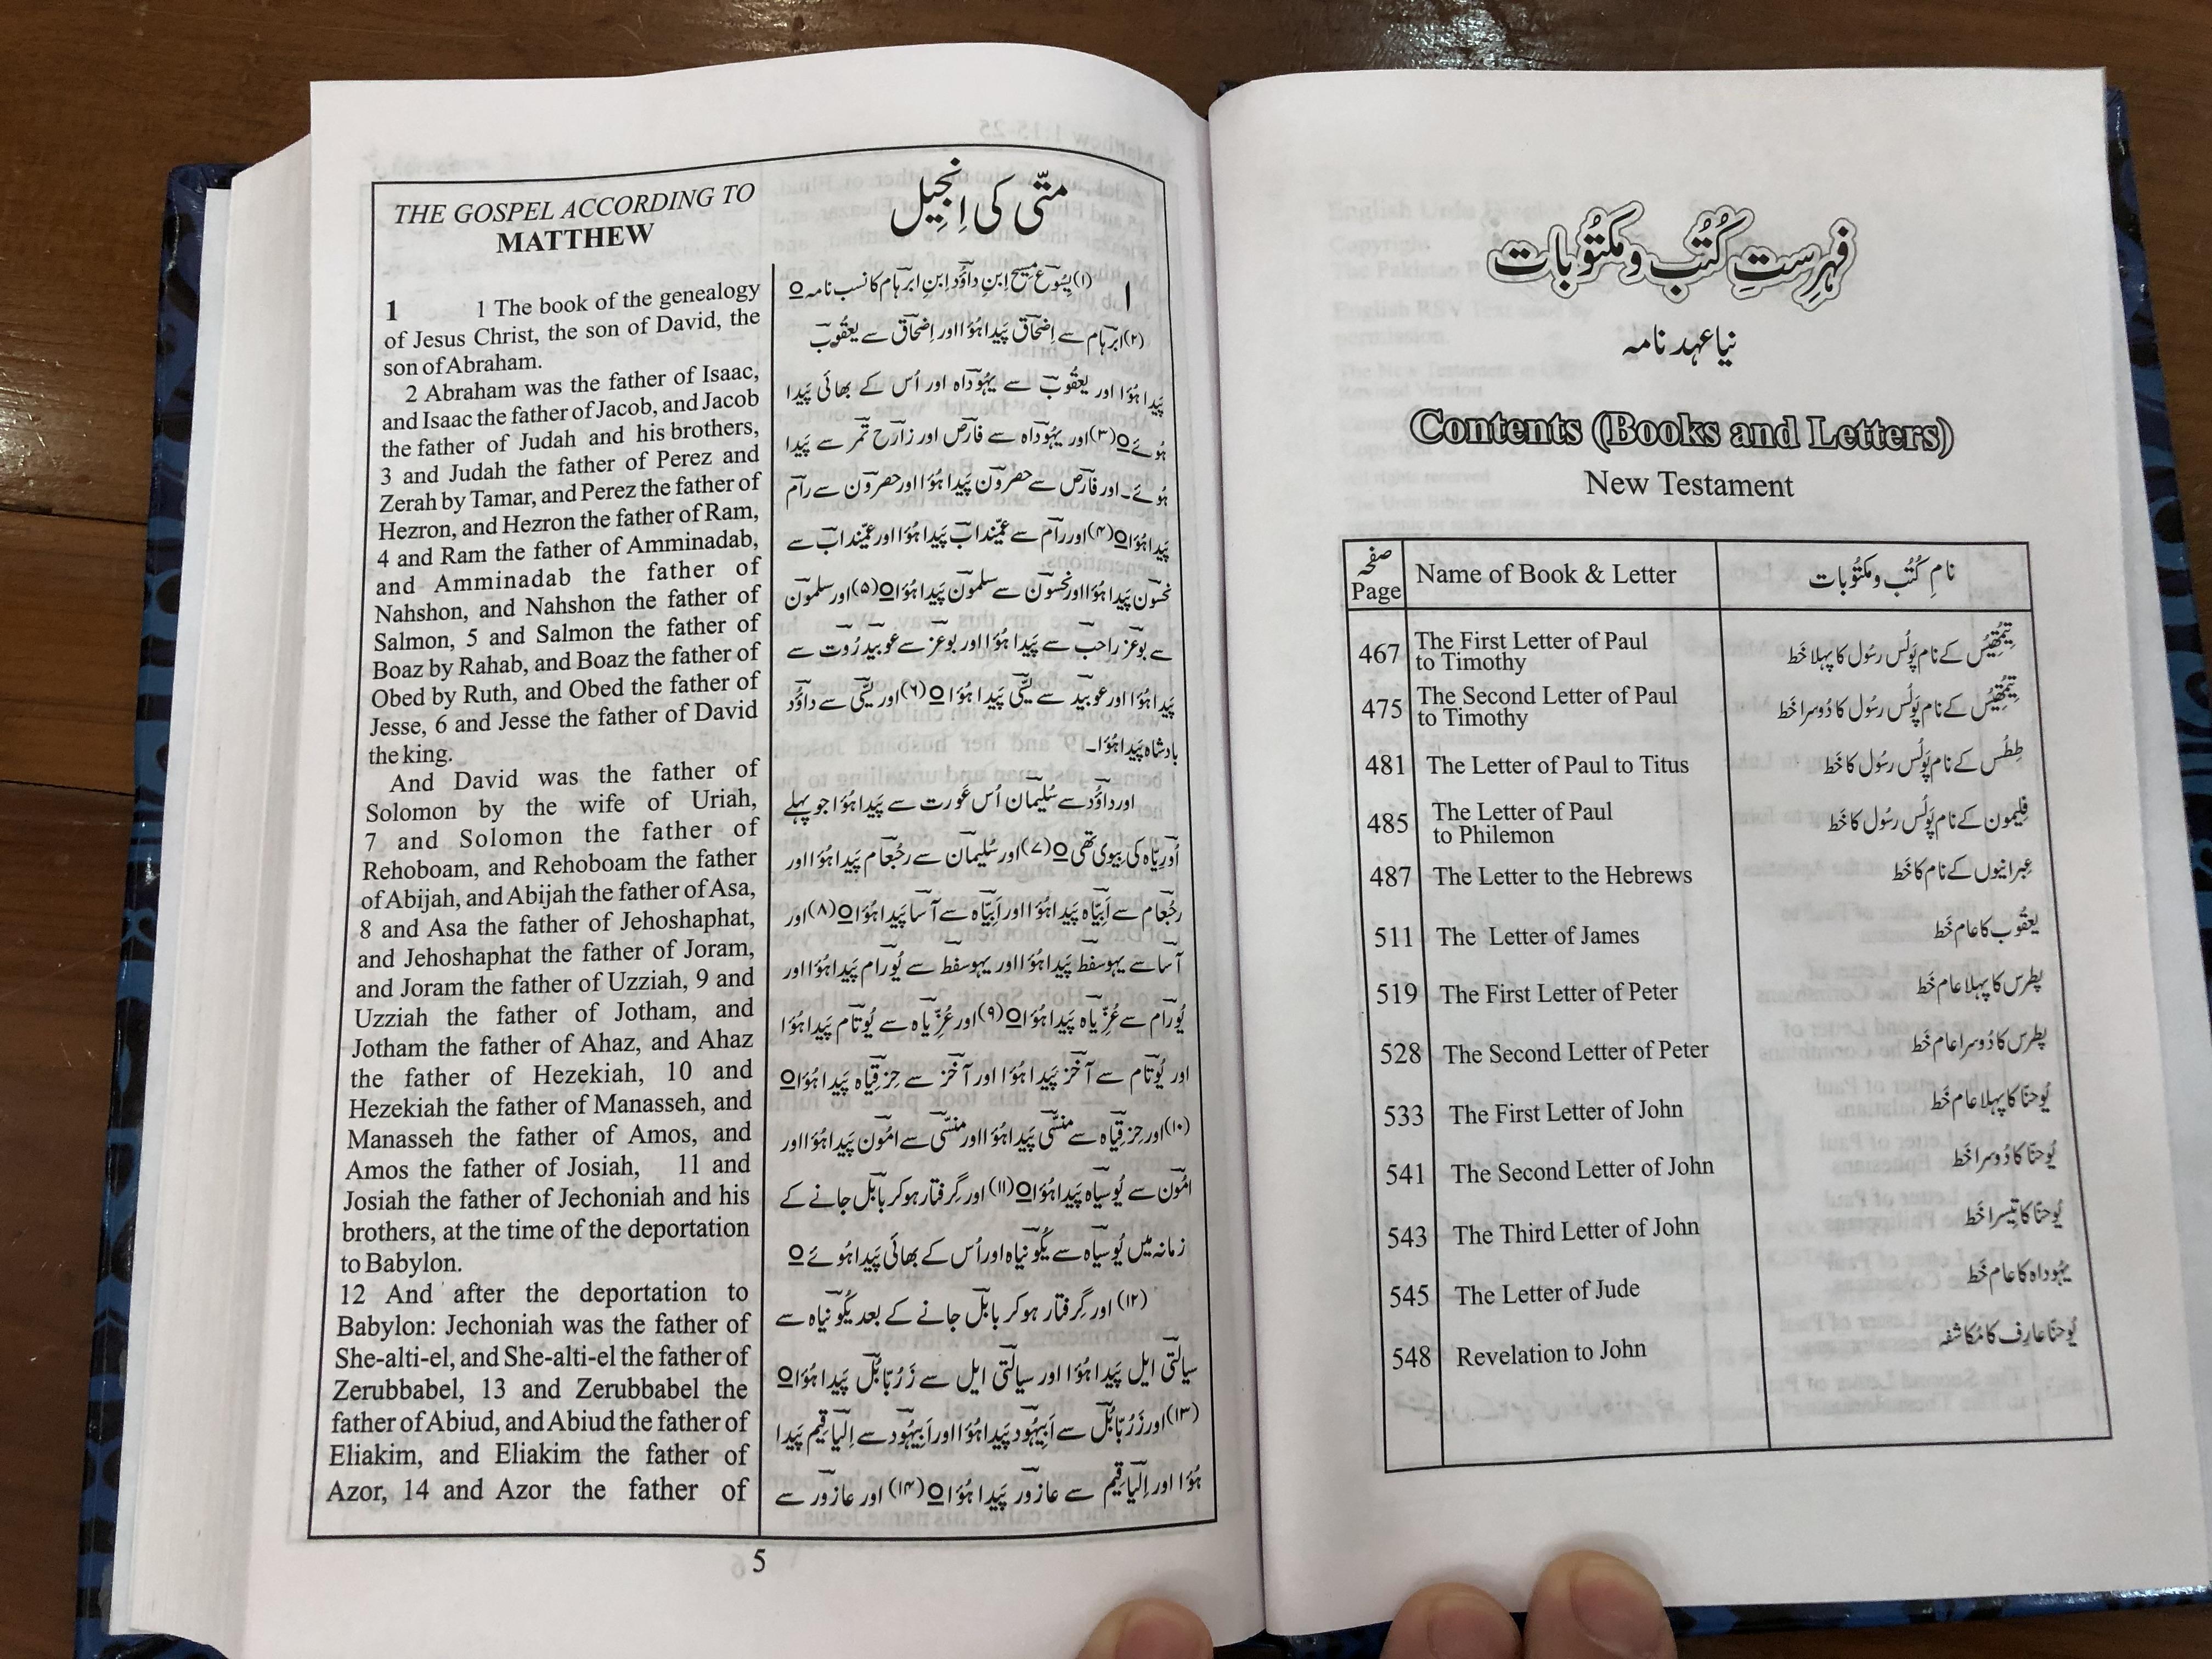 urdu-english-new-testament-the-good-news-the-new-covenant-english-urdu-diaglot-bilingual-new-testament-parallel-text-6-.jpg